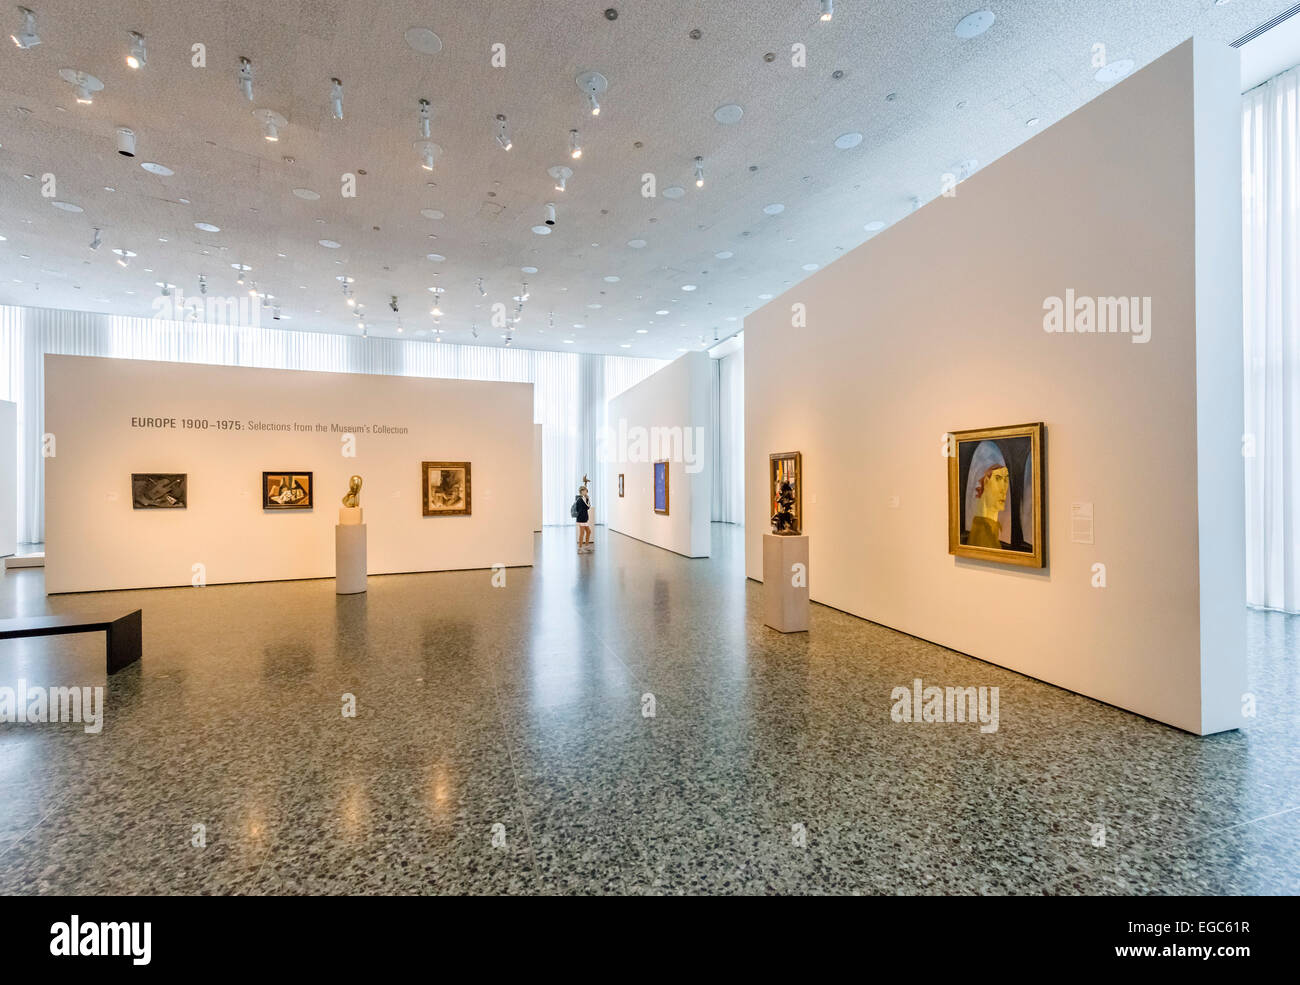 Gebäudeinnere Caroline Wiess Law an Museum der Künste, Houston, Texas, USA Stockbild